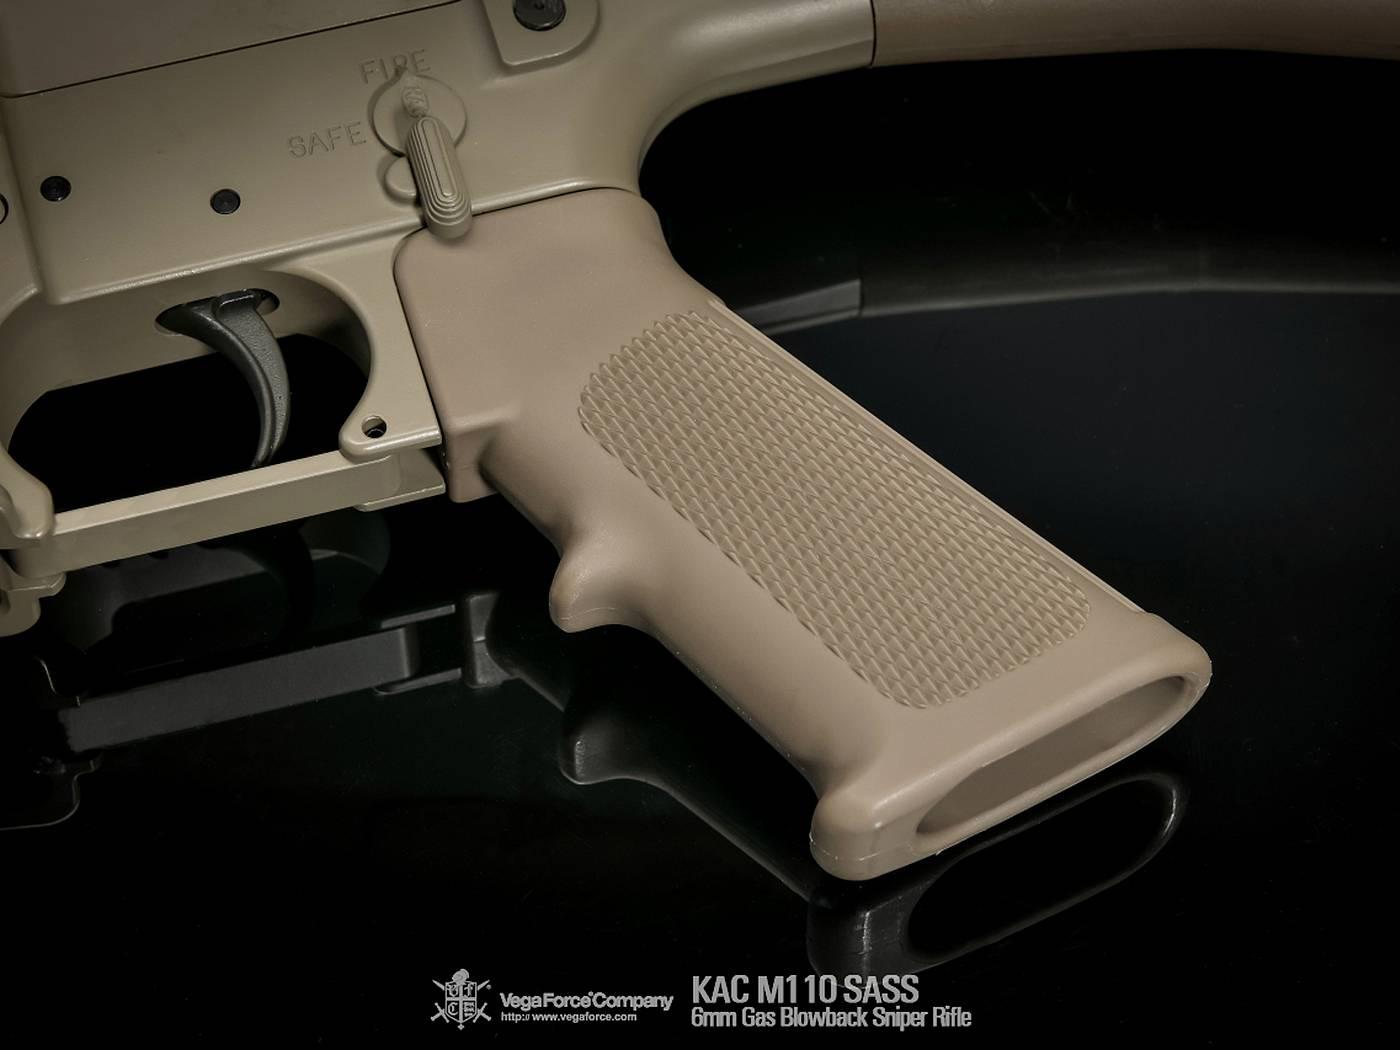 VFC ガスブローバック KAC M110 SASS *タン/日本仕様/ナイツアーマメントライセンス品 【品番:VF2J-LM110-TN01】